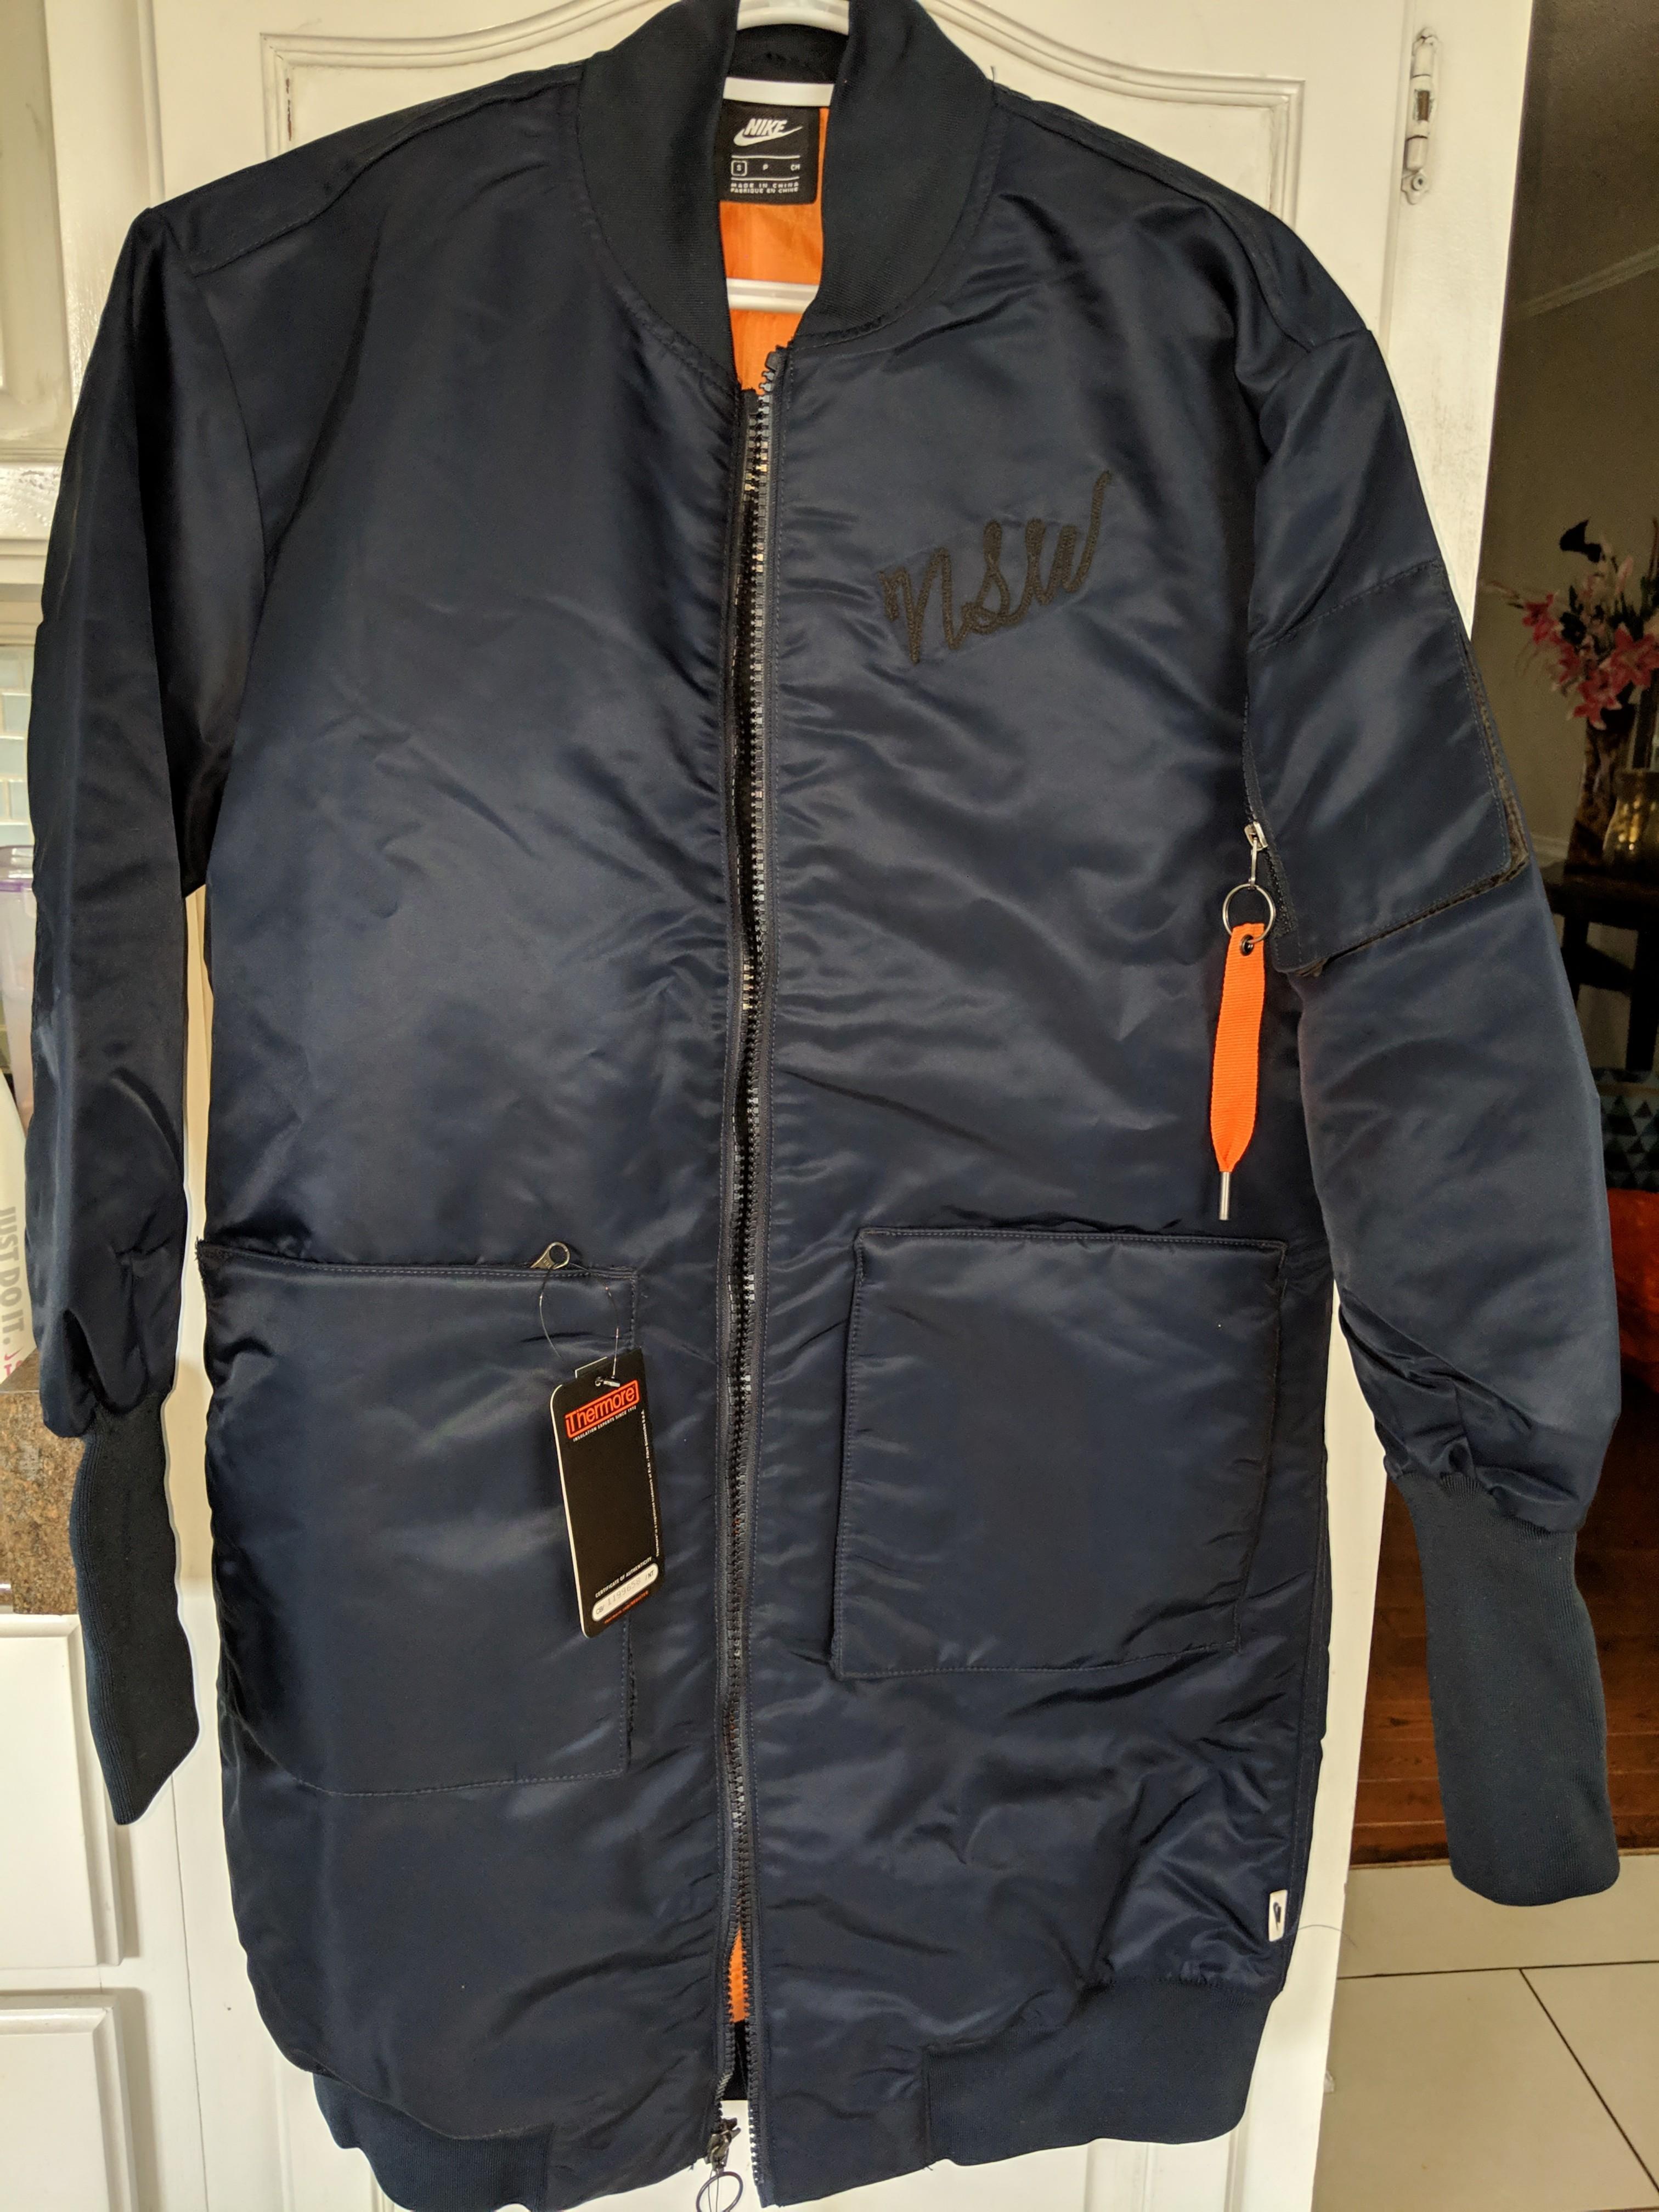 *PRICE DROPPED* NWT Nike Sportswear Navy bomber jacket